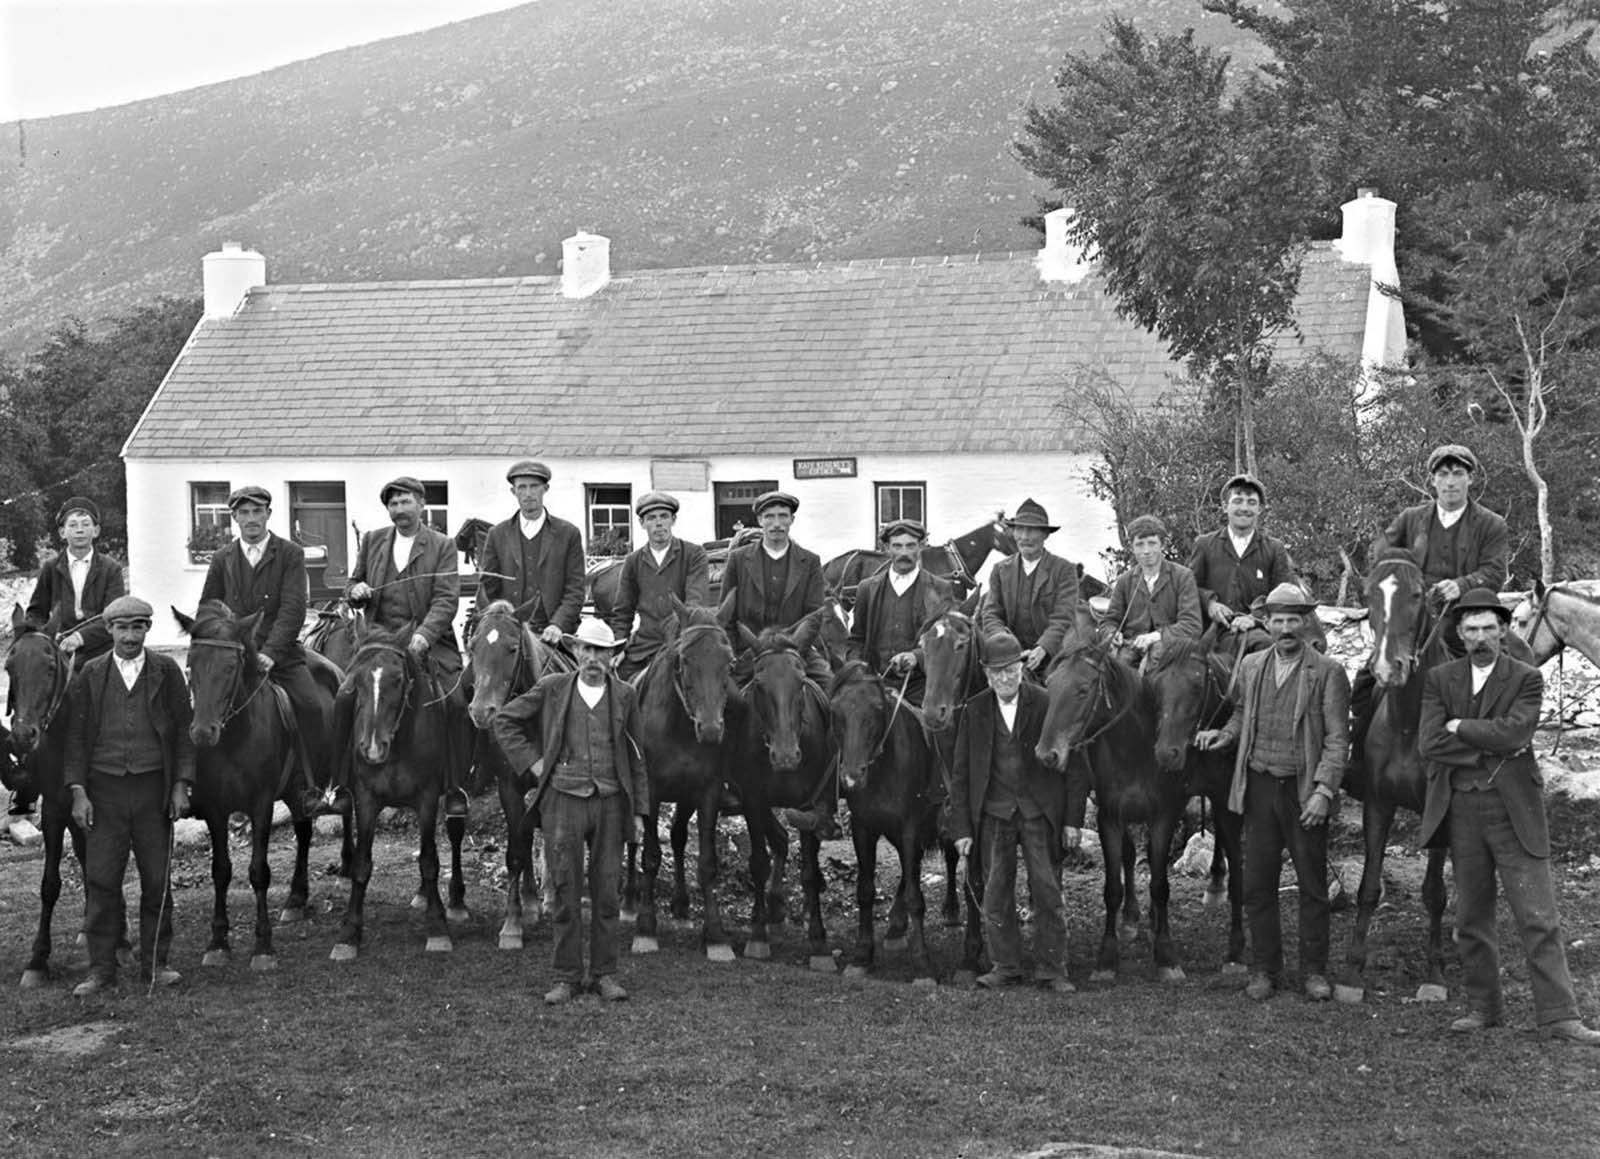 Men on horseback in front of Kate Kearney's Cottage in Kerry. 1900.